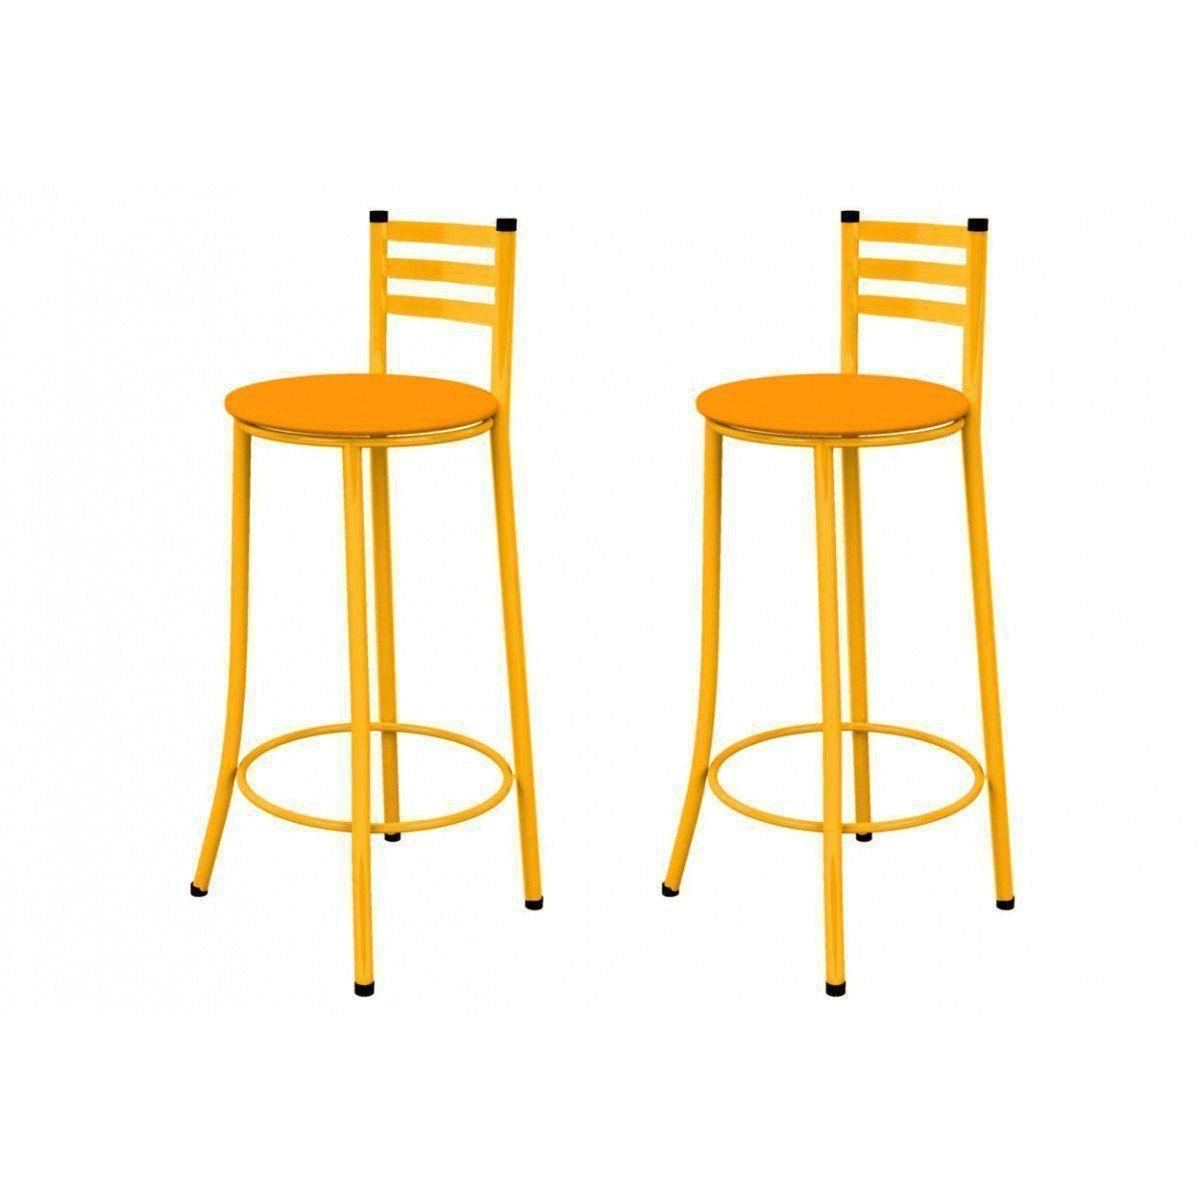 Kit 02 Banquetas Altas com Encosto 86 cm Amarelo - Marcheli